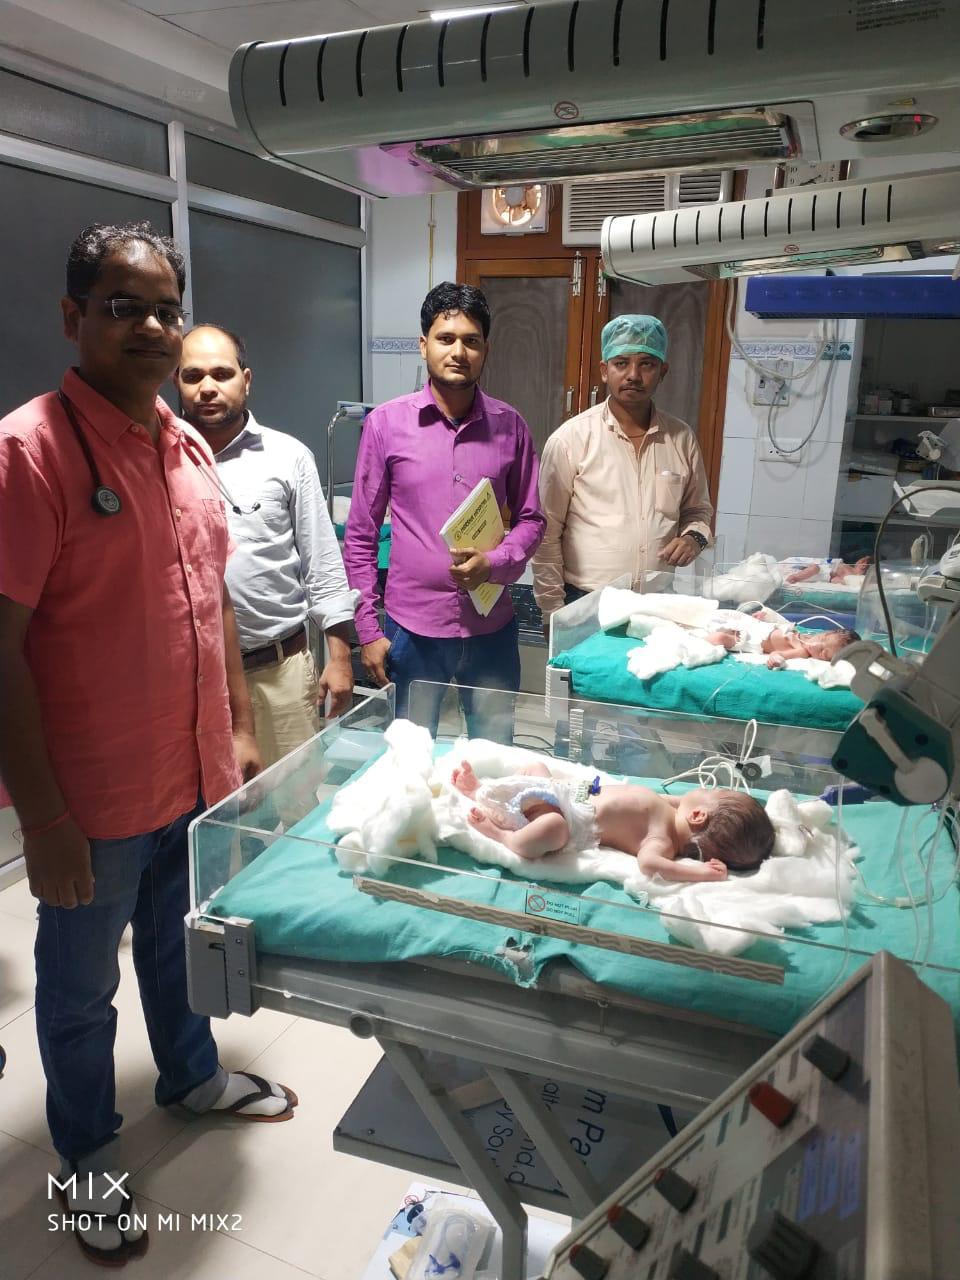 Quadruplets, Four babies, Muslim woman, UP woman delivers quadruplets, First baby, IVF technology, Twins, Triplets, Lucknow, Uttar Pradesh news, Regional news